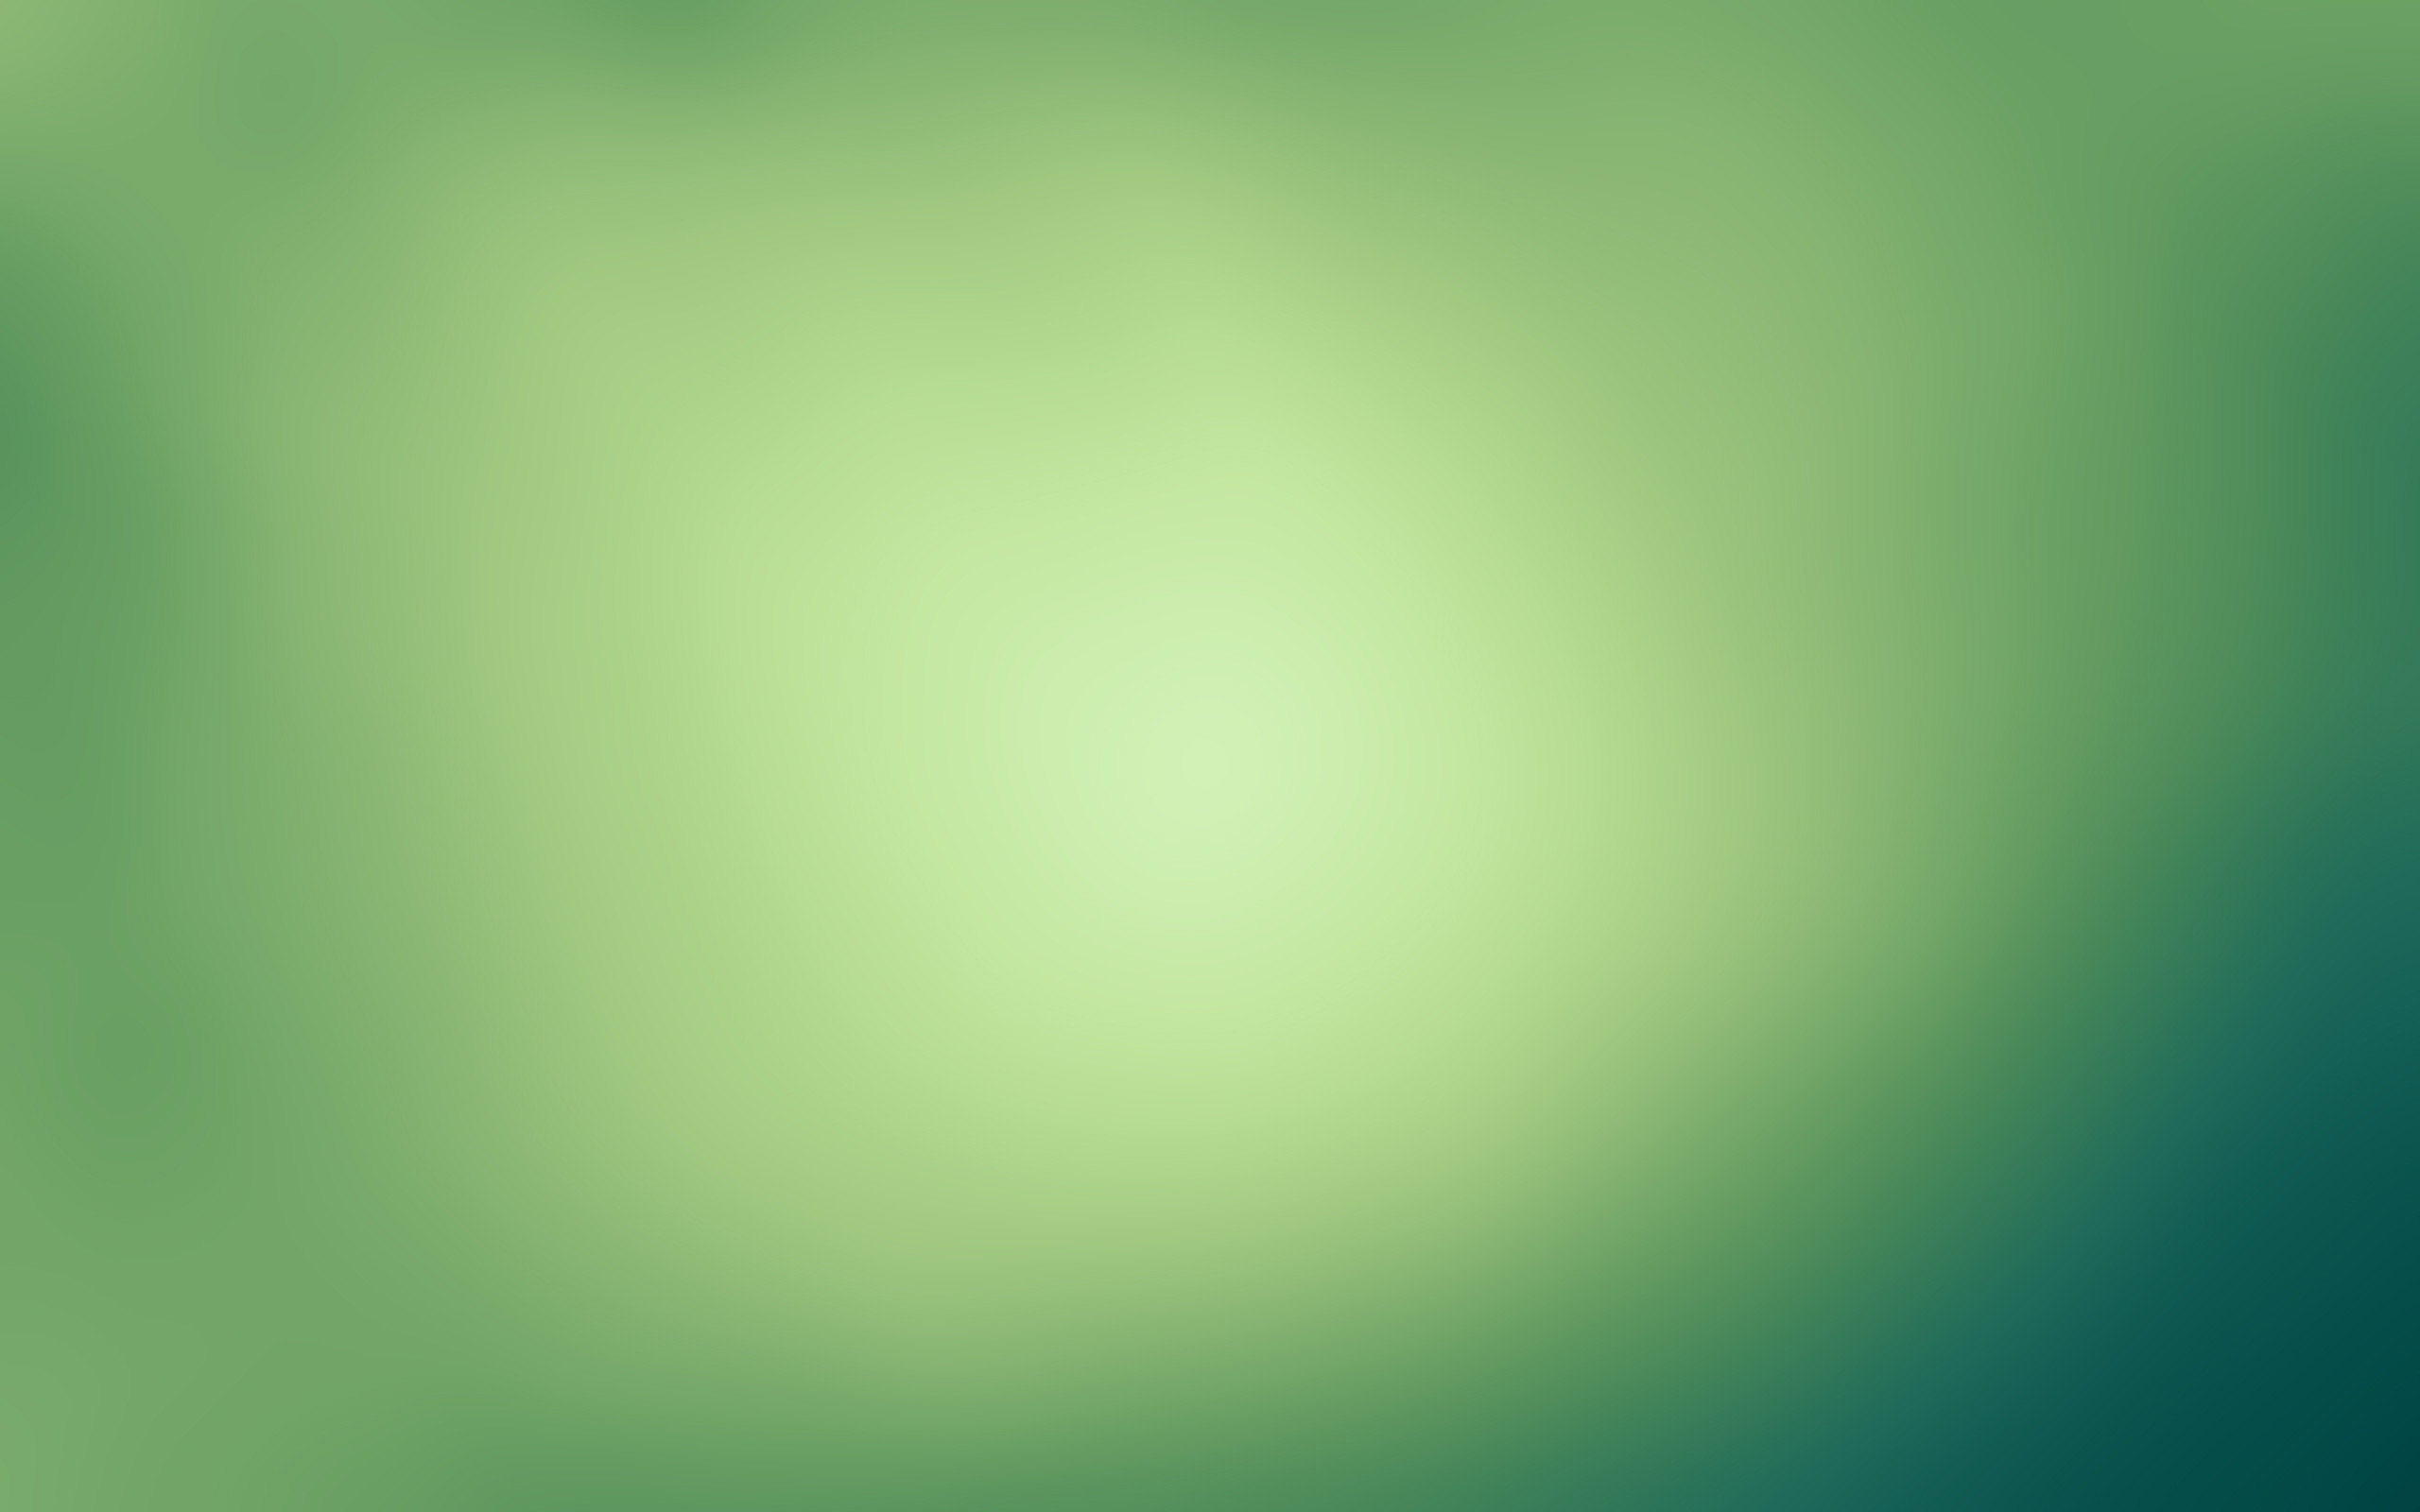 cool blue and grey backgrounds | Backgrounds | Pinterest | Hd wallpaper,  Wallpaper and Hd desktop